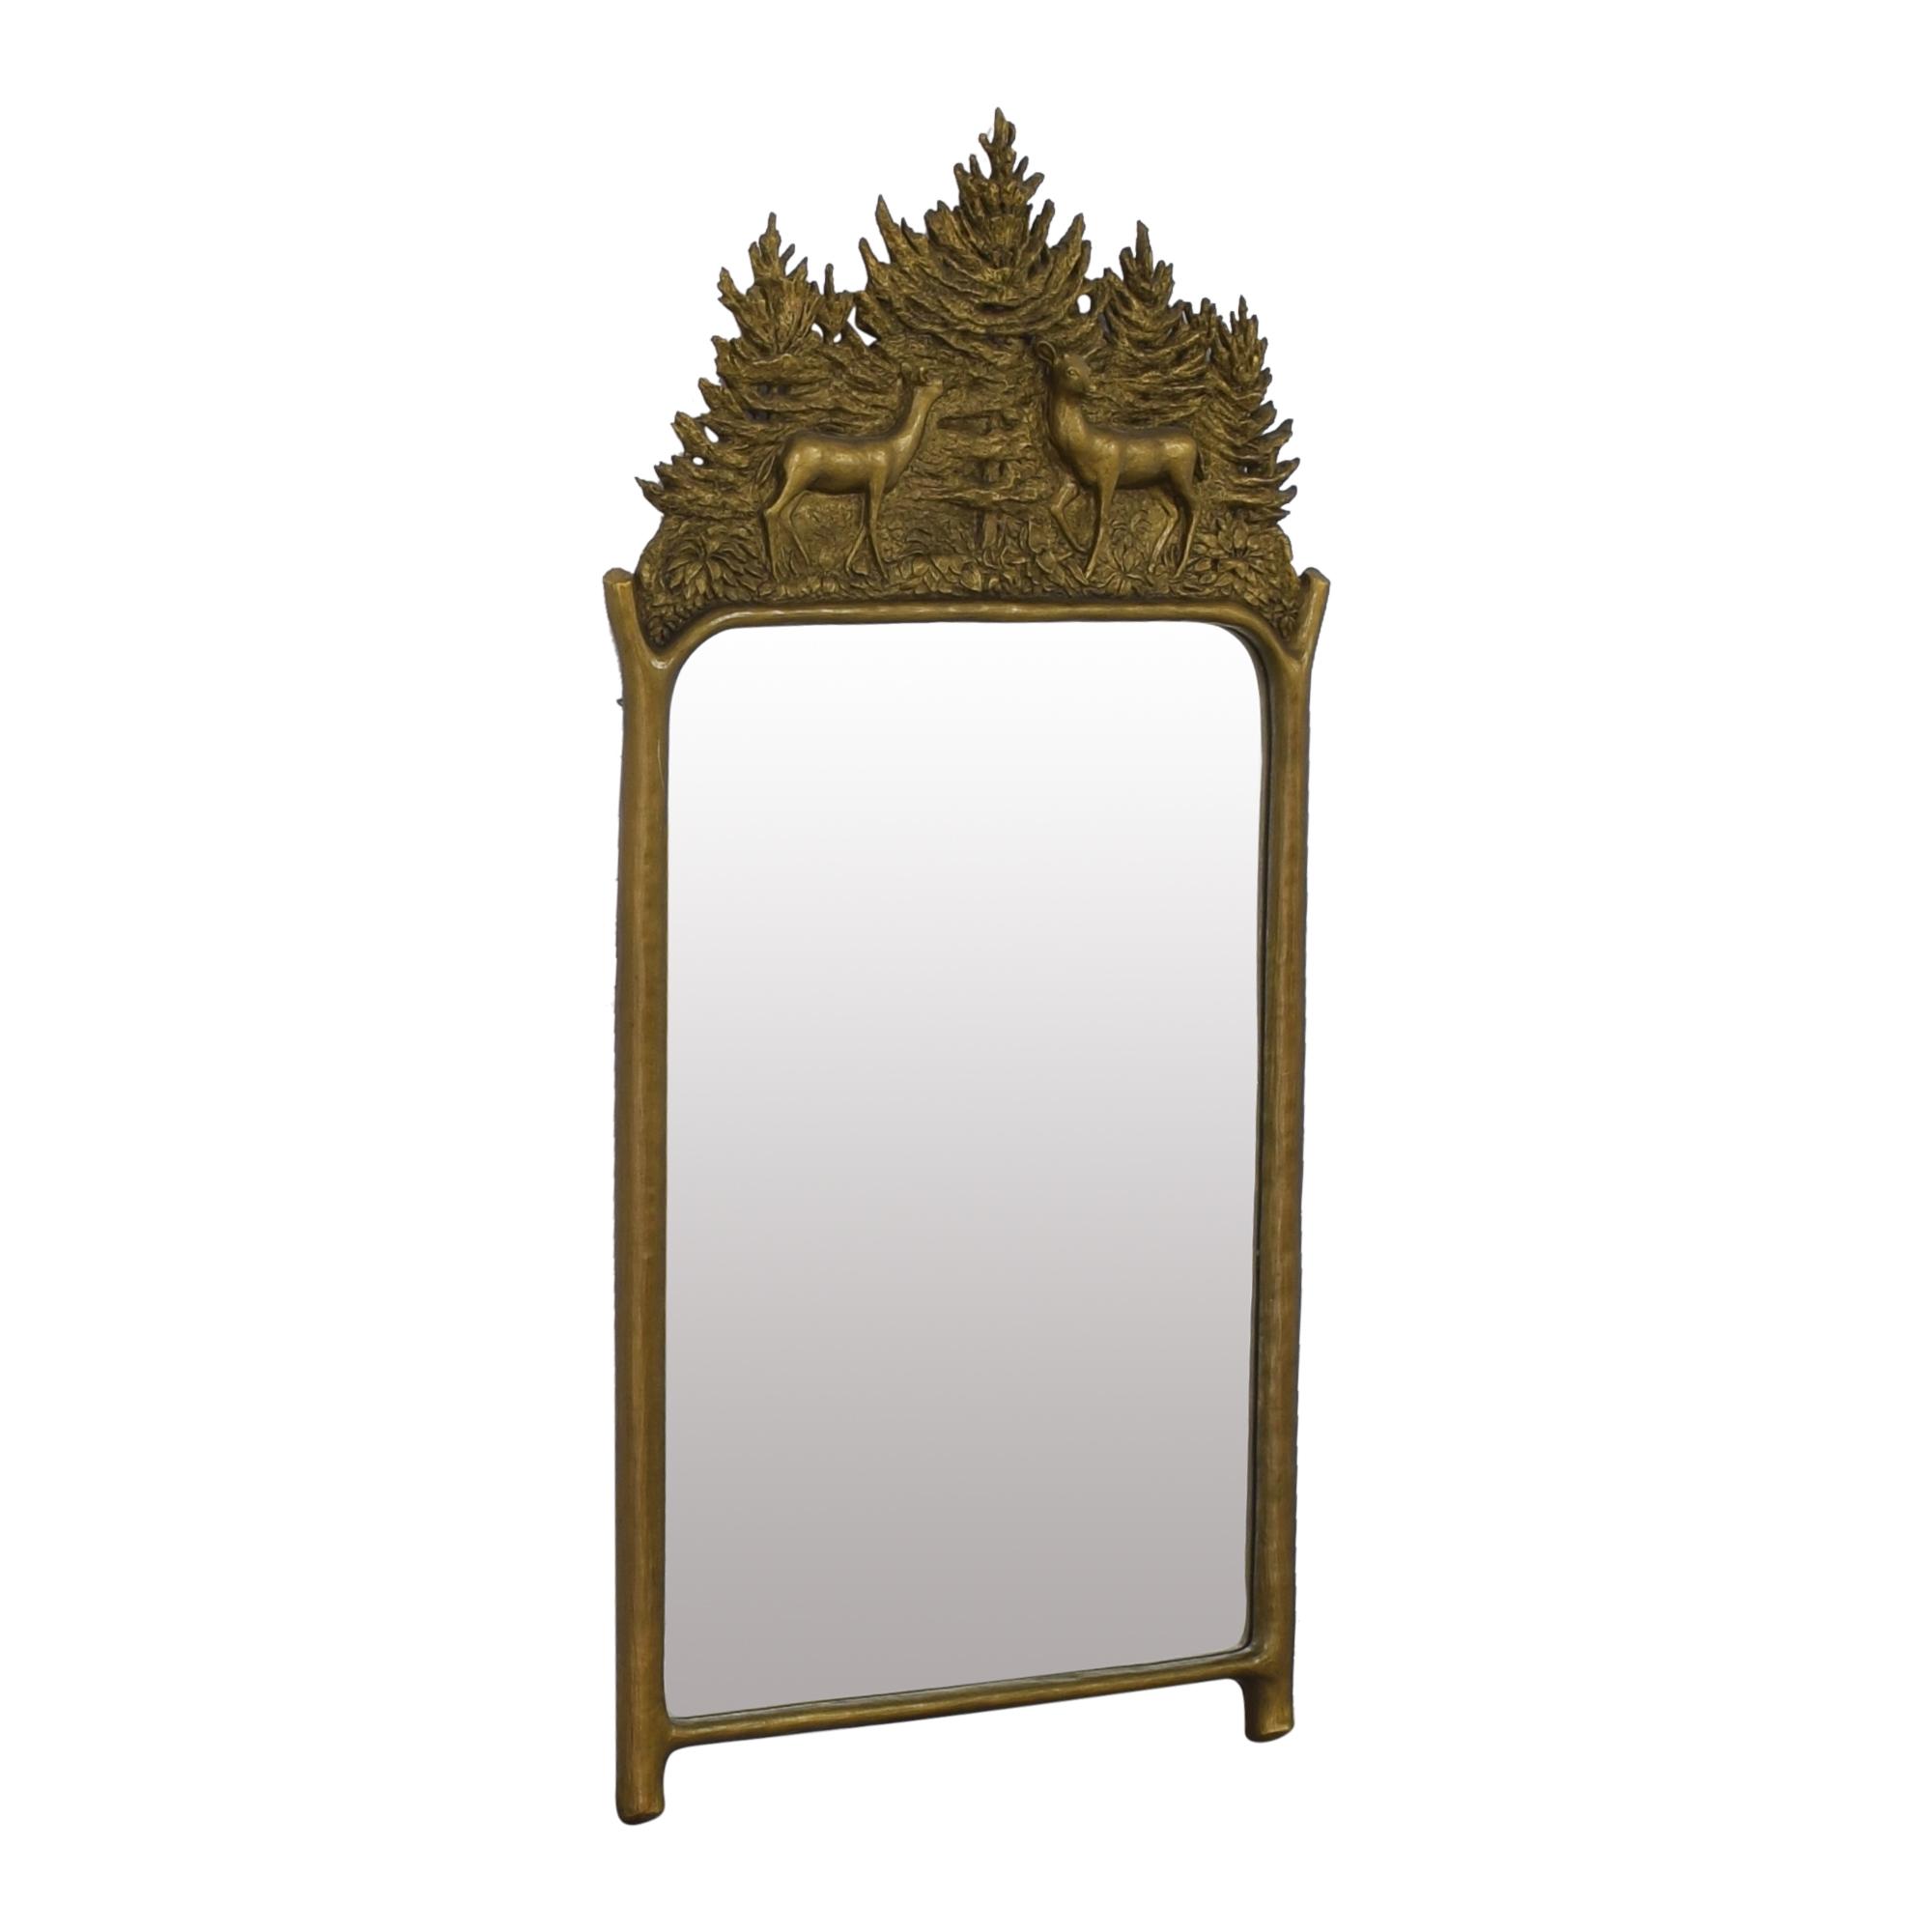 shop Carvers' Guild Traditional Mirror Carvers' Guild Decor